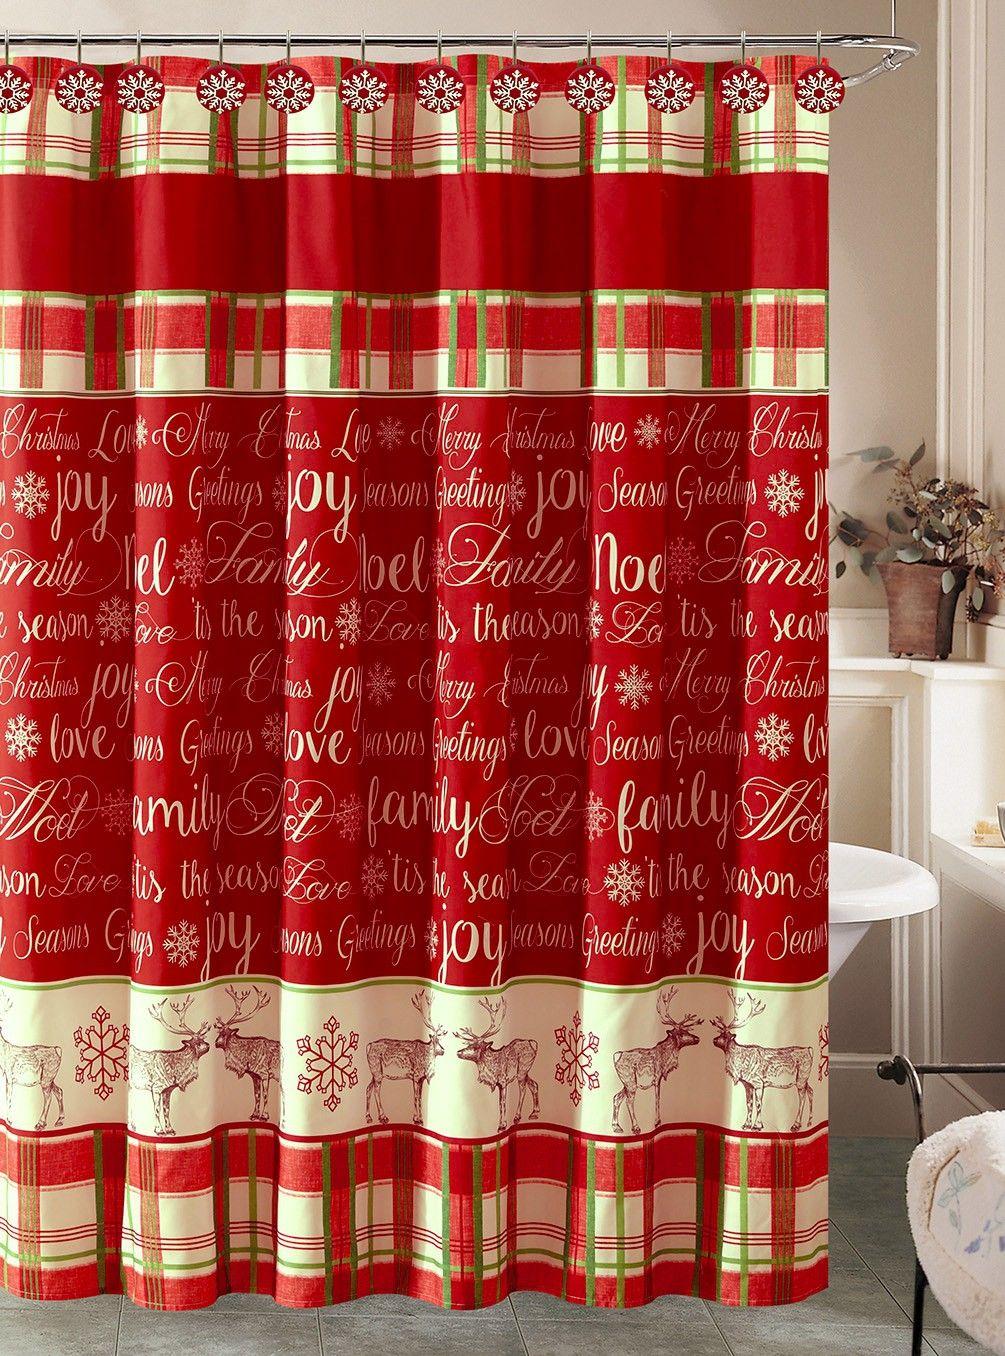 Beatrice Seasons Joy Christmas Holiday Shower Curtain And 12 Shower Hooks Bathroom Set Holiday Shower Curtains Bathroom Sets Christmas Bathroom